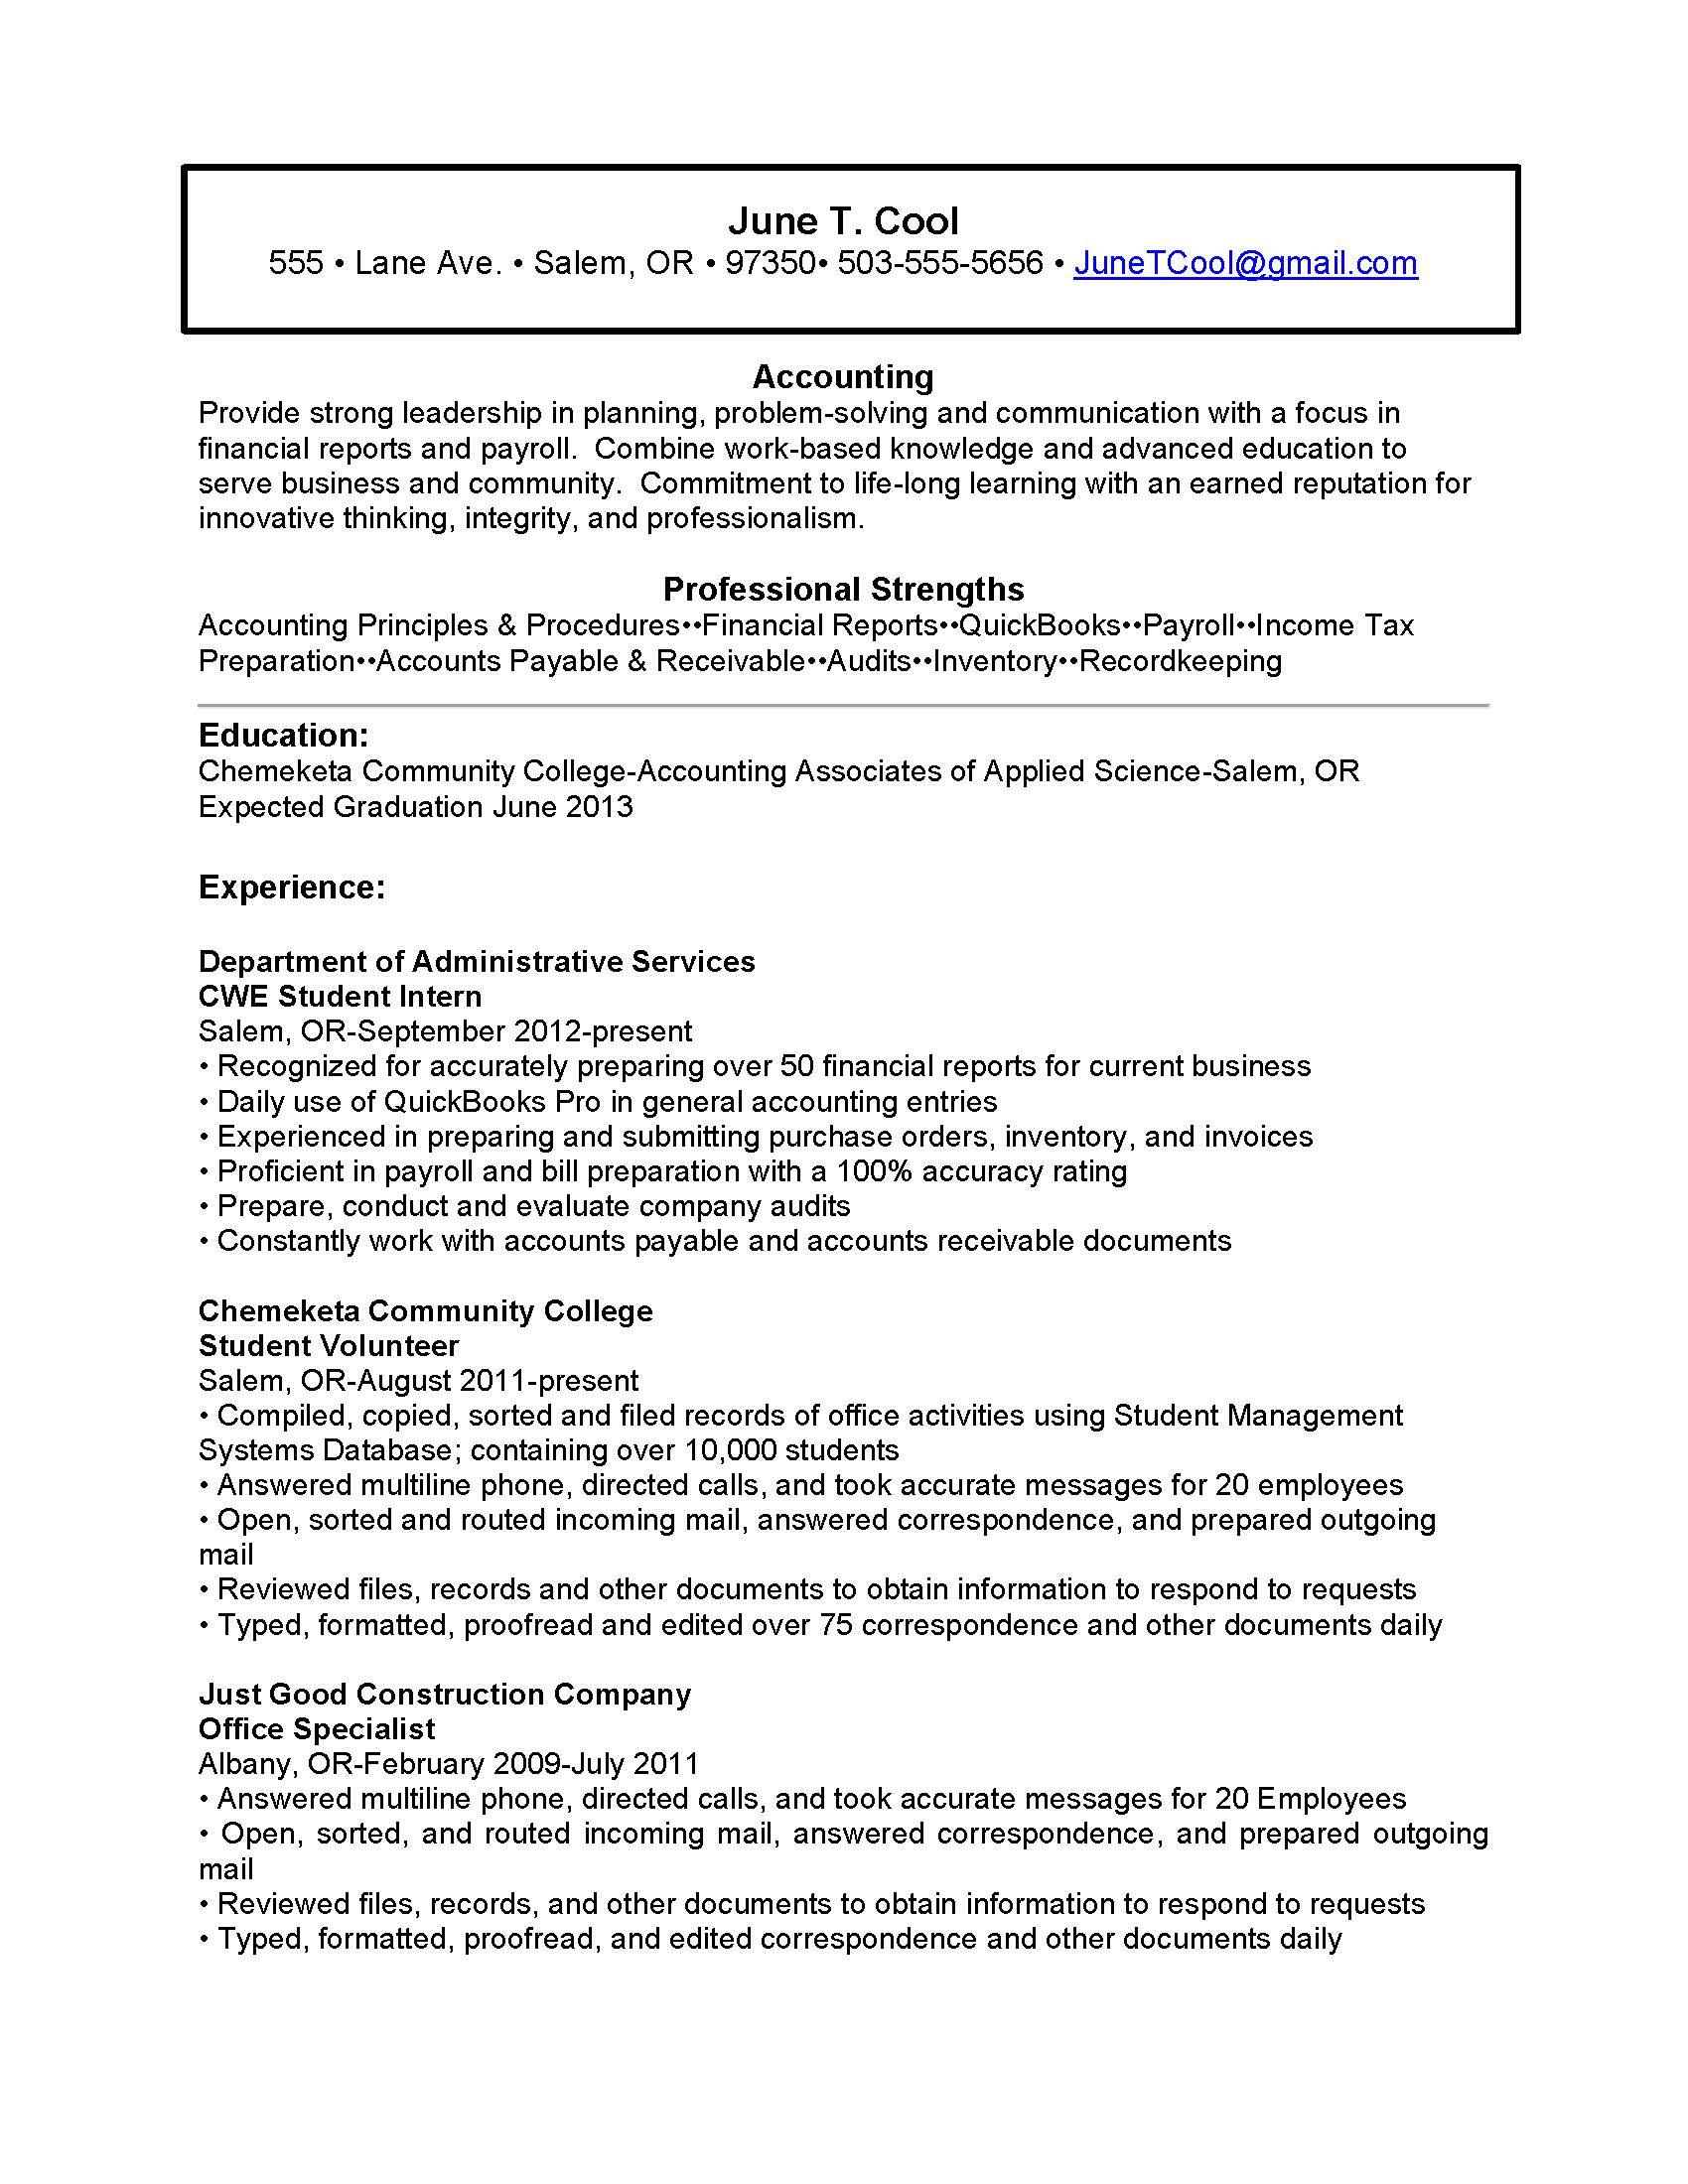 5 Best Images Of Functional Resume Worksheet